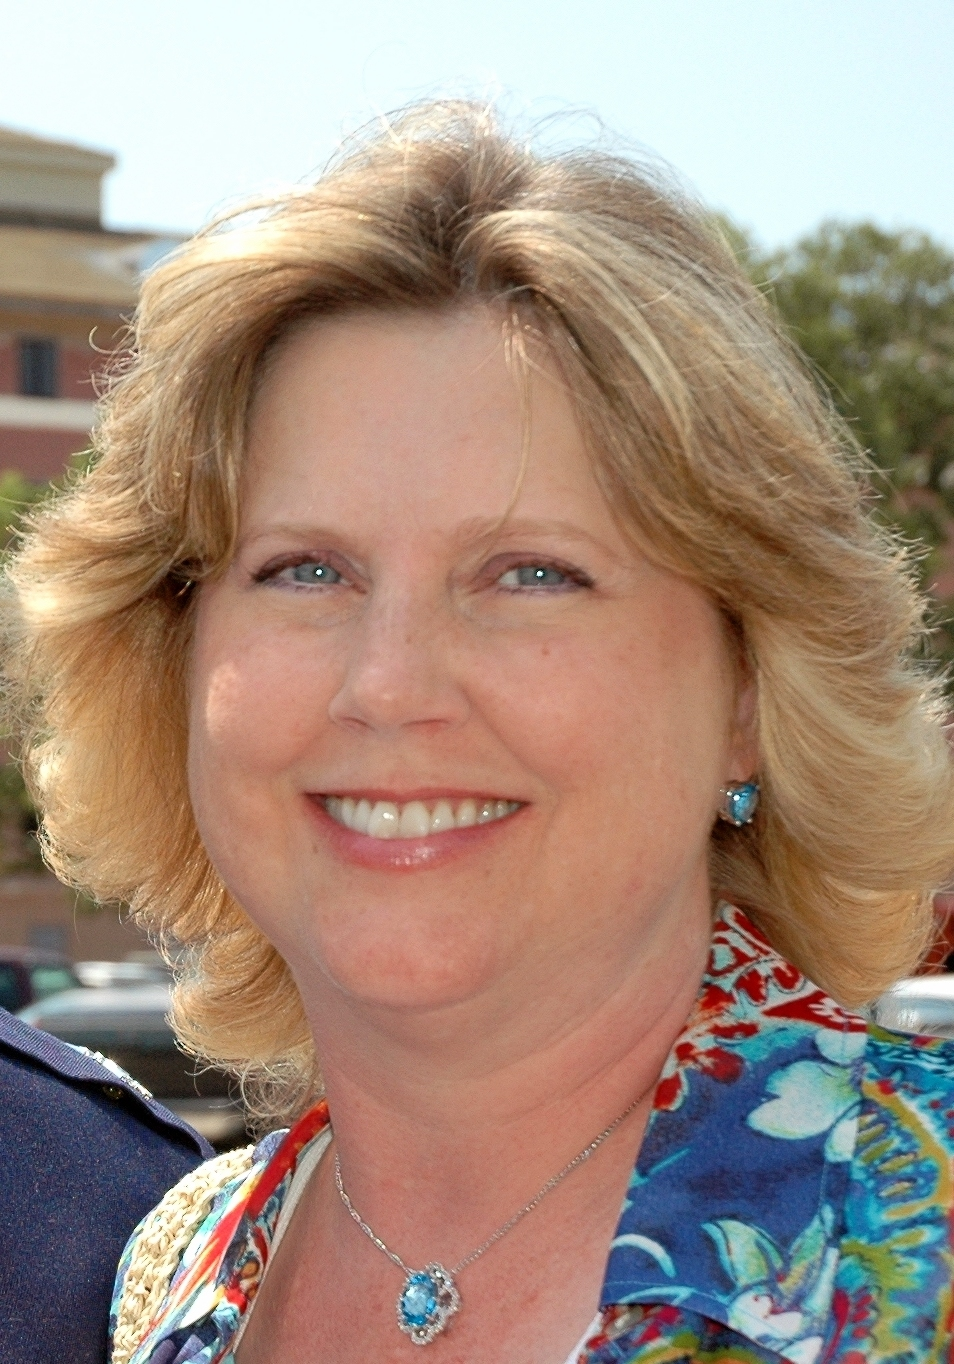 Headshot of Cindy Kimberly